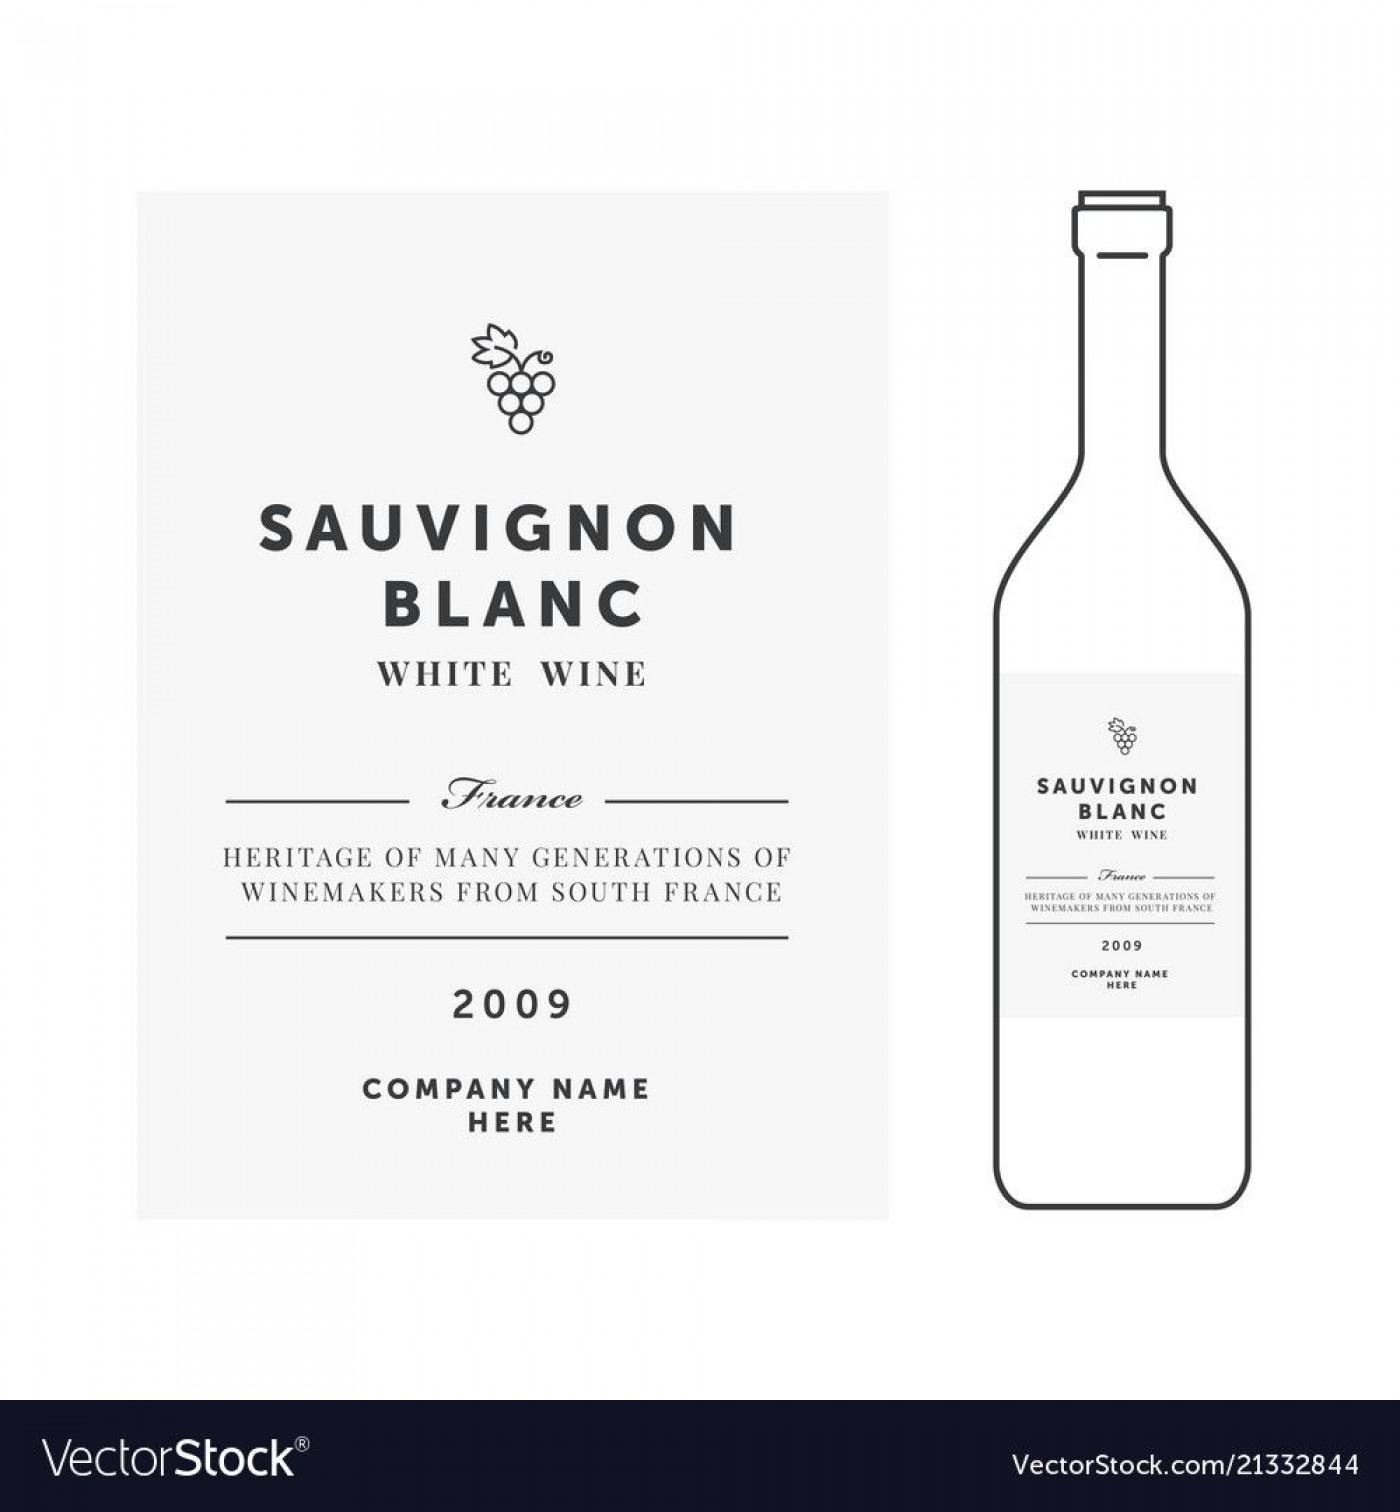 008 Imposing Free Wine Label Template Idea  Bottle Microsoft Word Online Psd1400